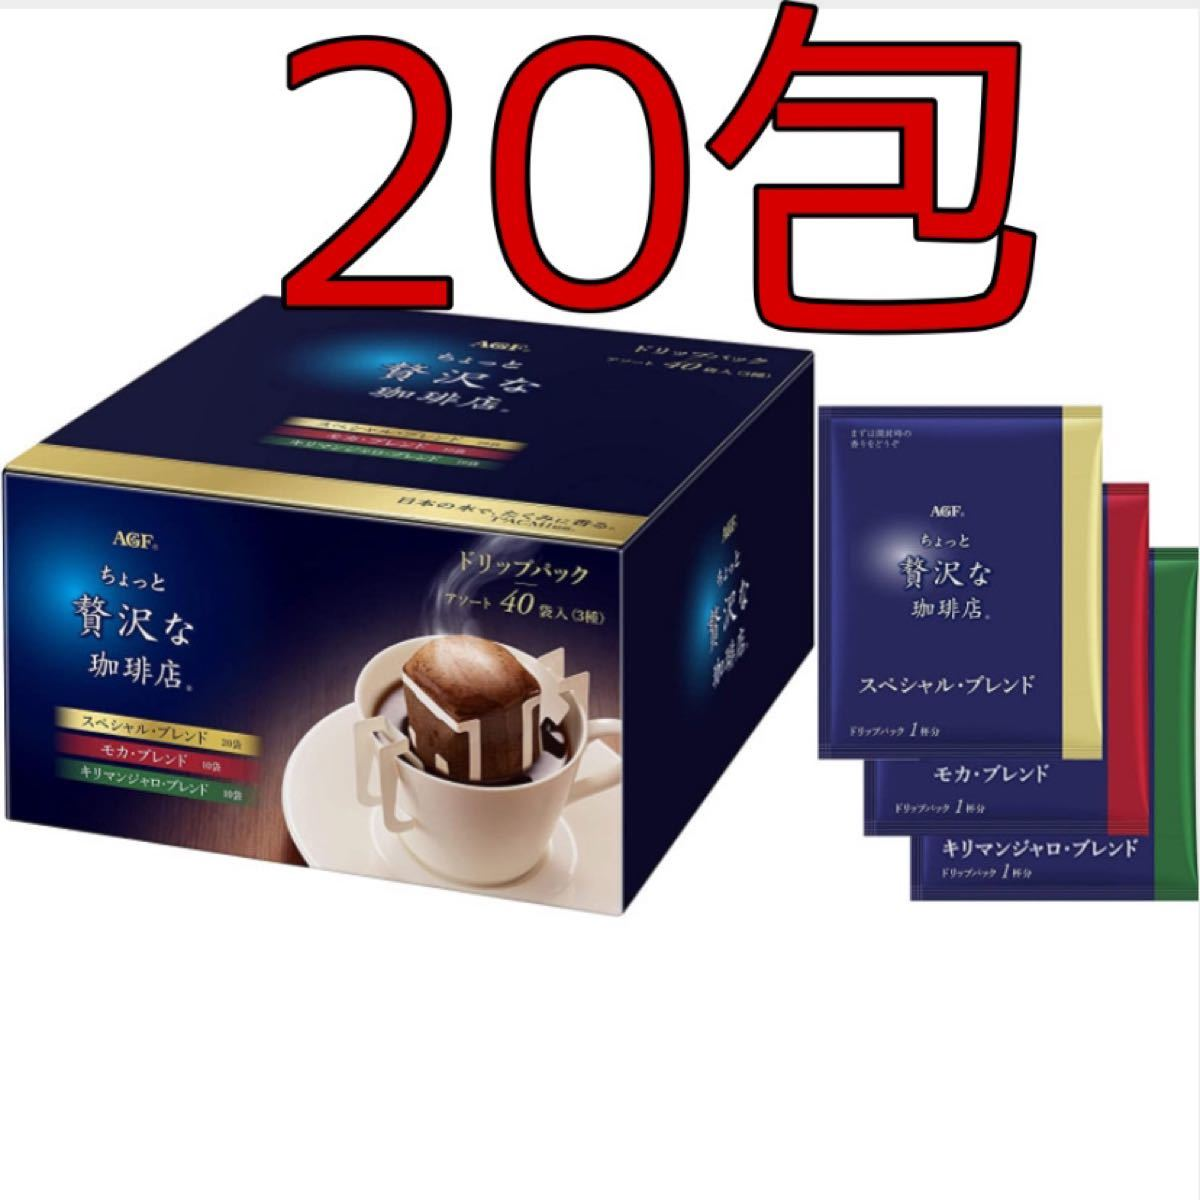 AGF ちょっと贅沢な珈琲店 レギュラー コーヒー プレミアムドリップ アソート  20包